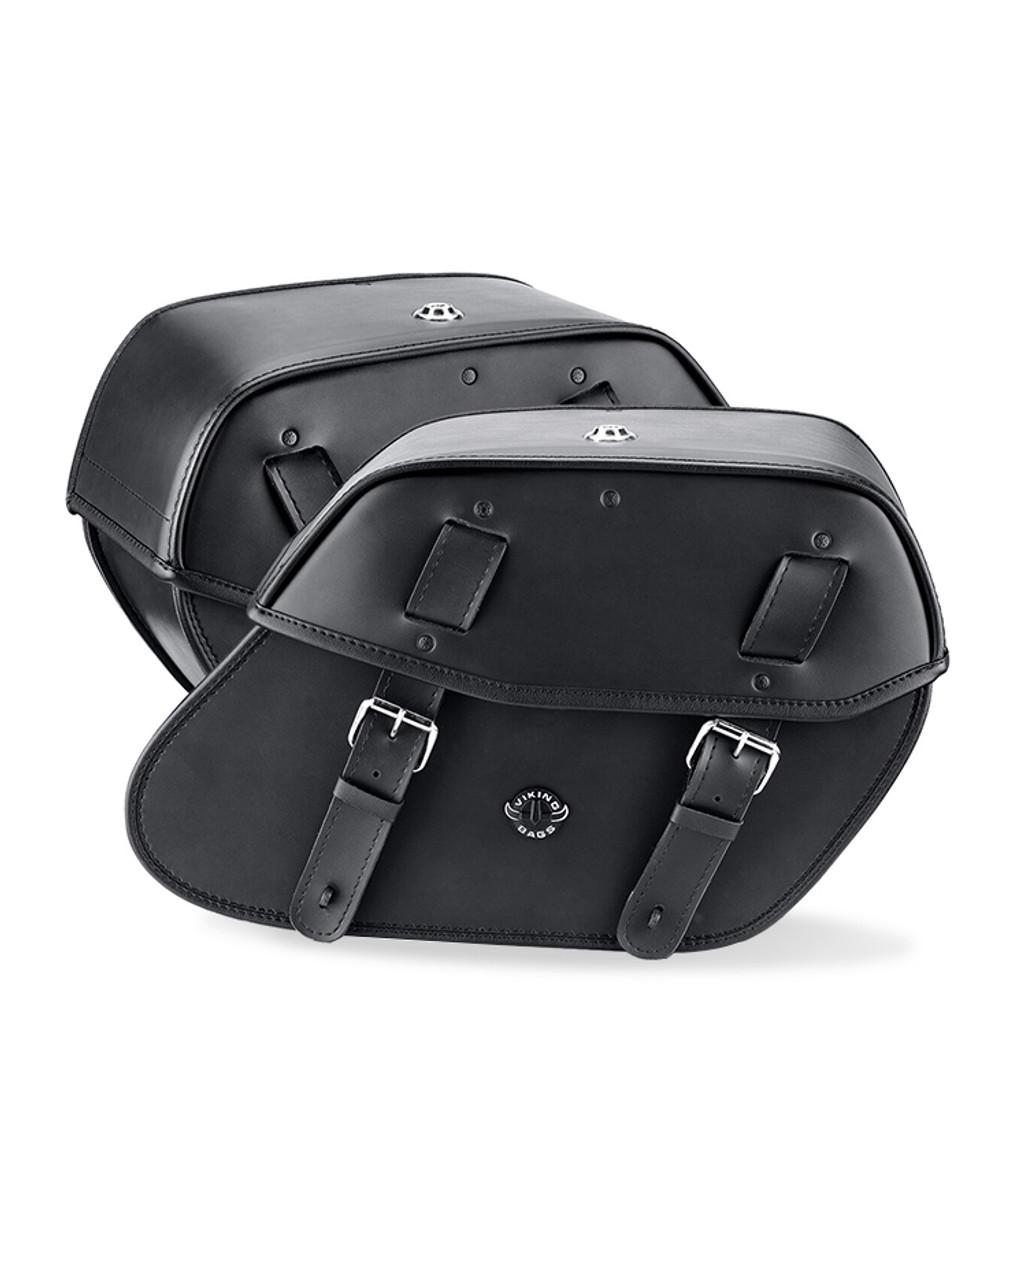 Honda VTX 1800 R Viking Odin Medium Motorcycle Saddlebags Both Bags View